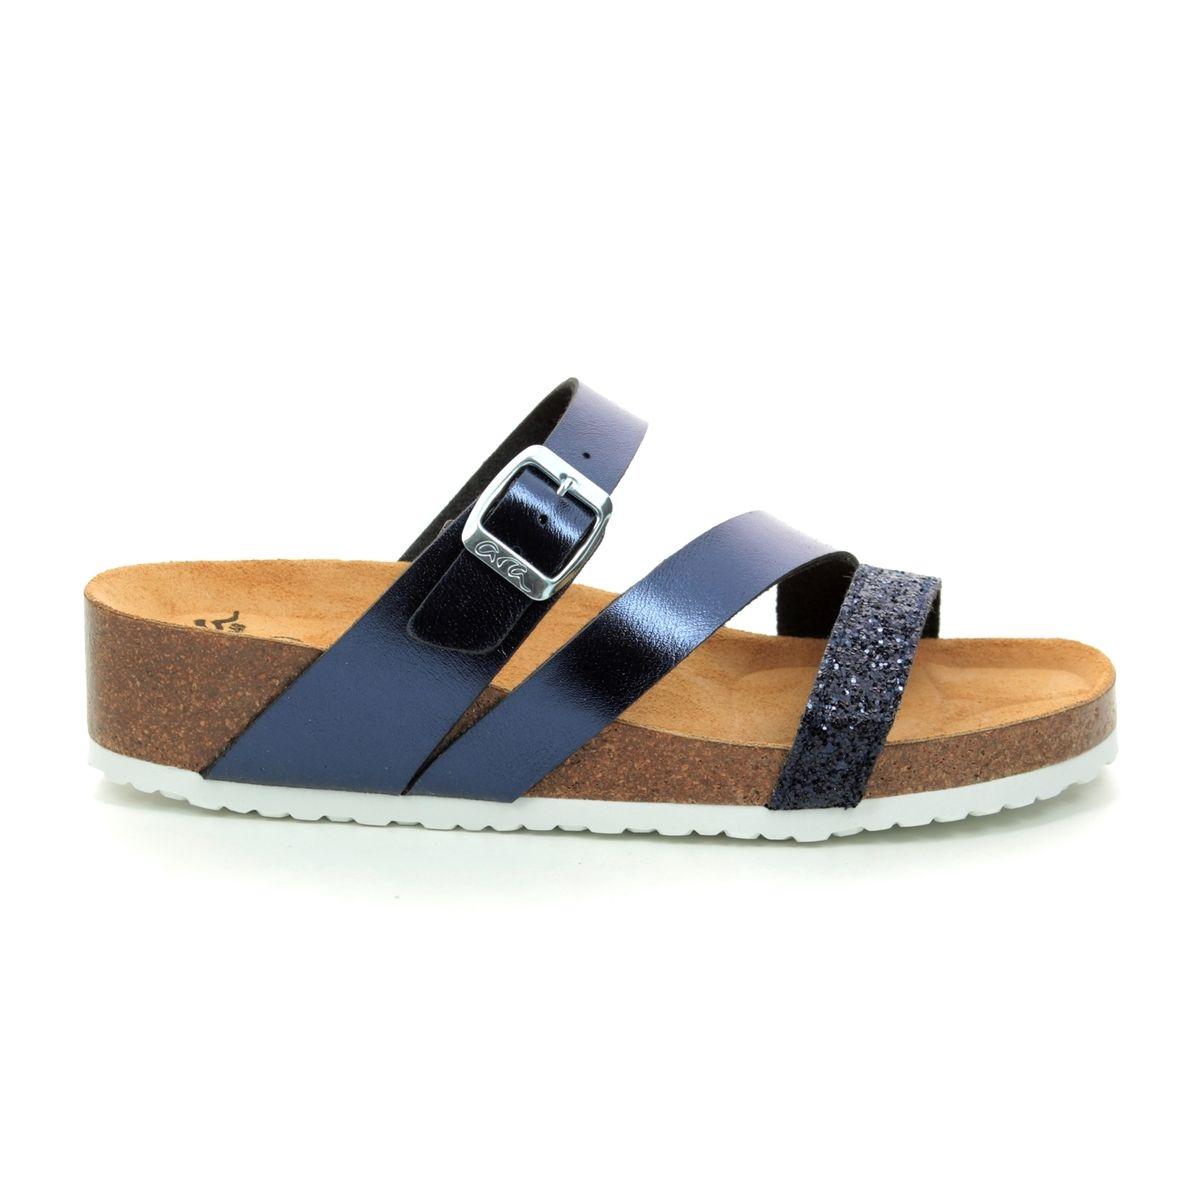 0367164629a Ara Slide Sandals - Navy multi - 17277 02 BALI STRAP